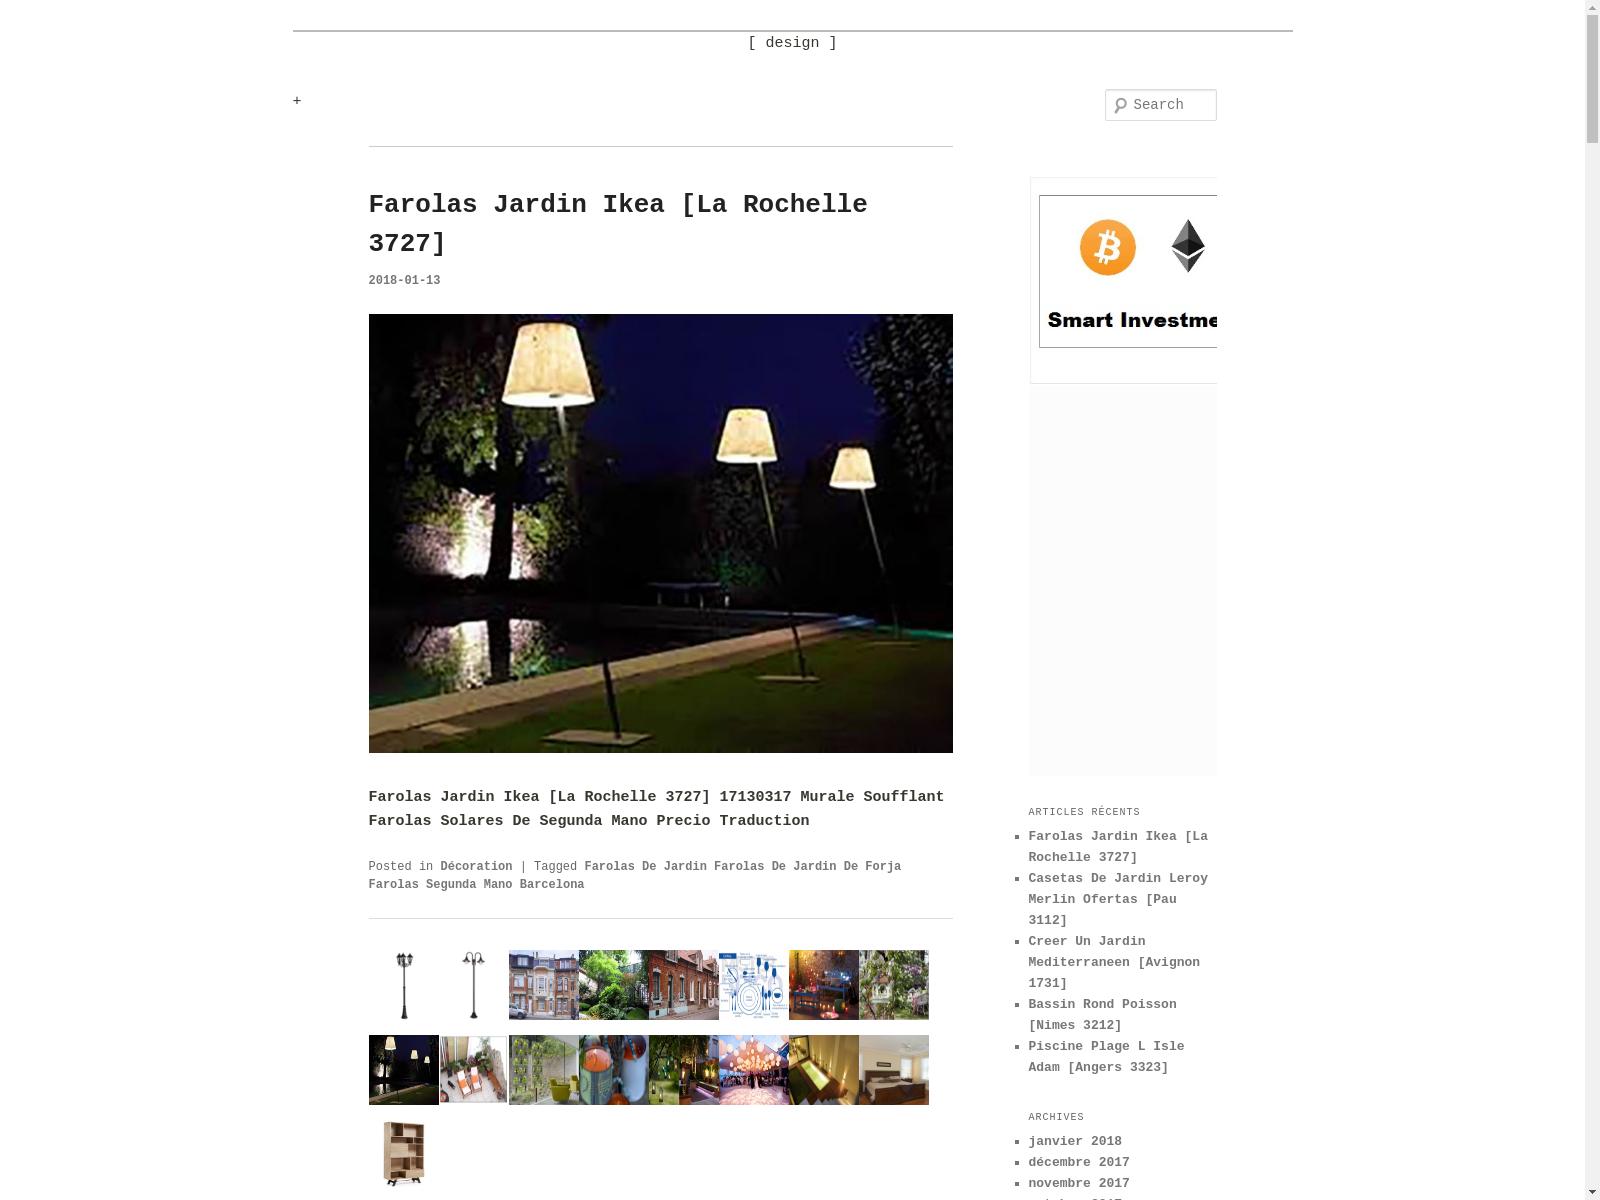 Thebests.us - Urlscan.io destiné Fontaine De Jardin Leroy Merlin